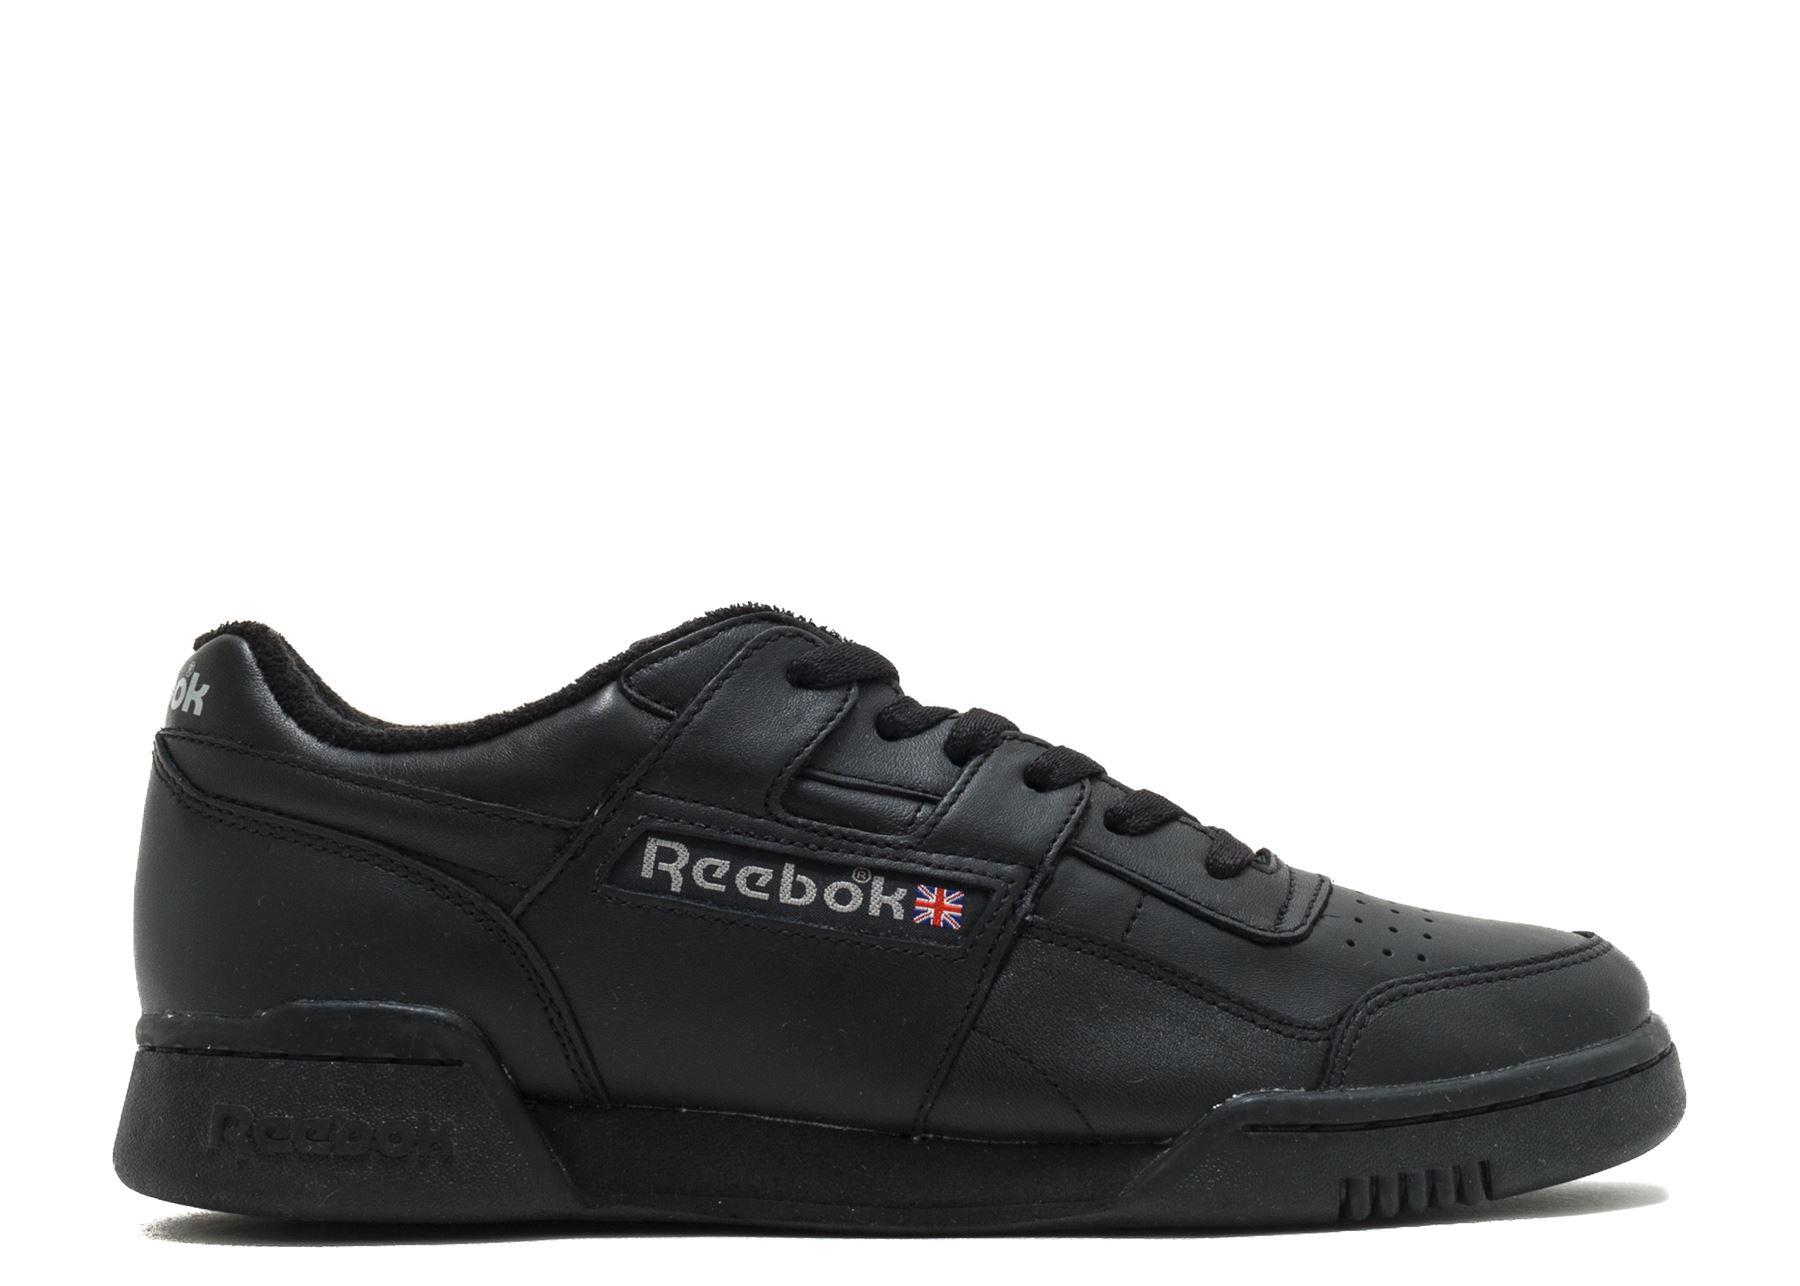 Reebok Workout Plus Vintage Trainers Mens Black Sneakers